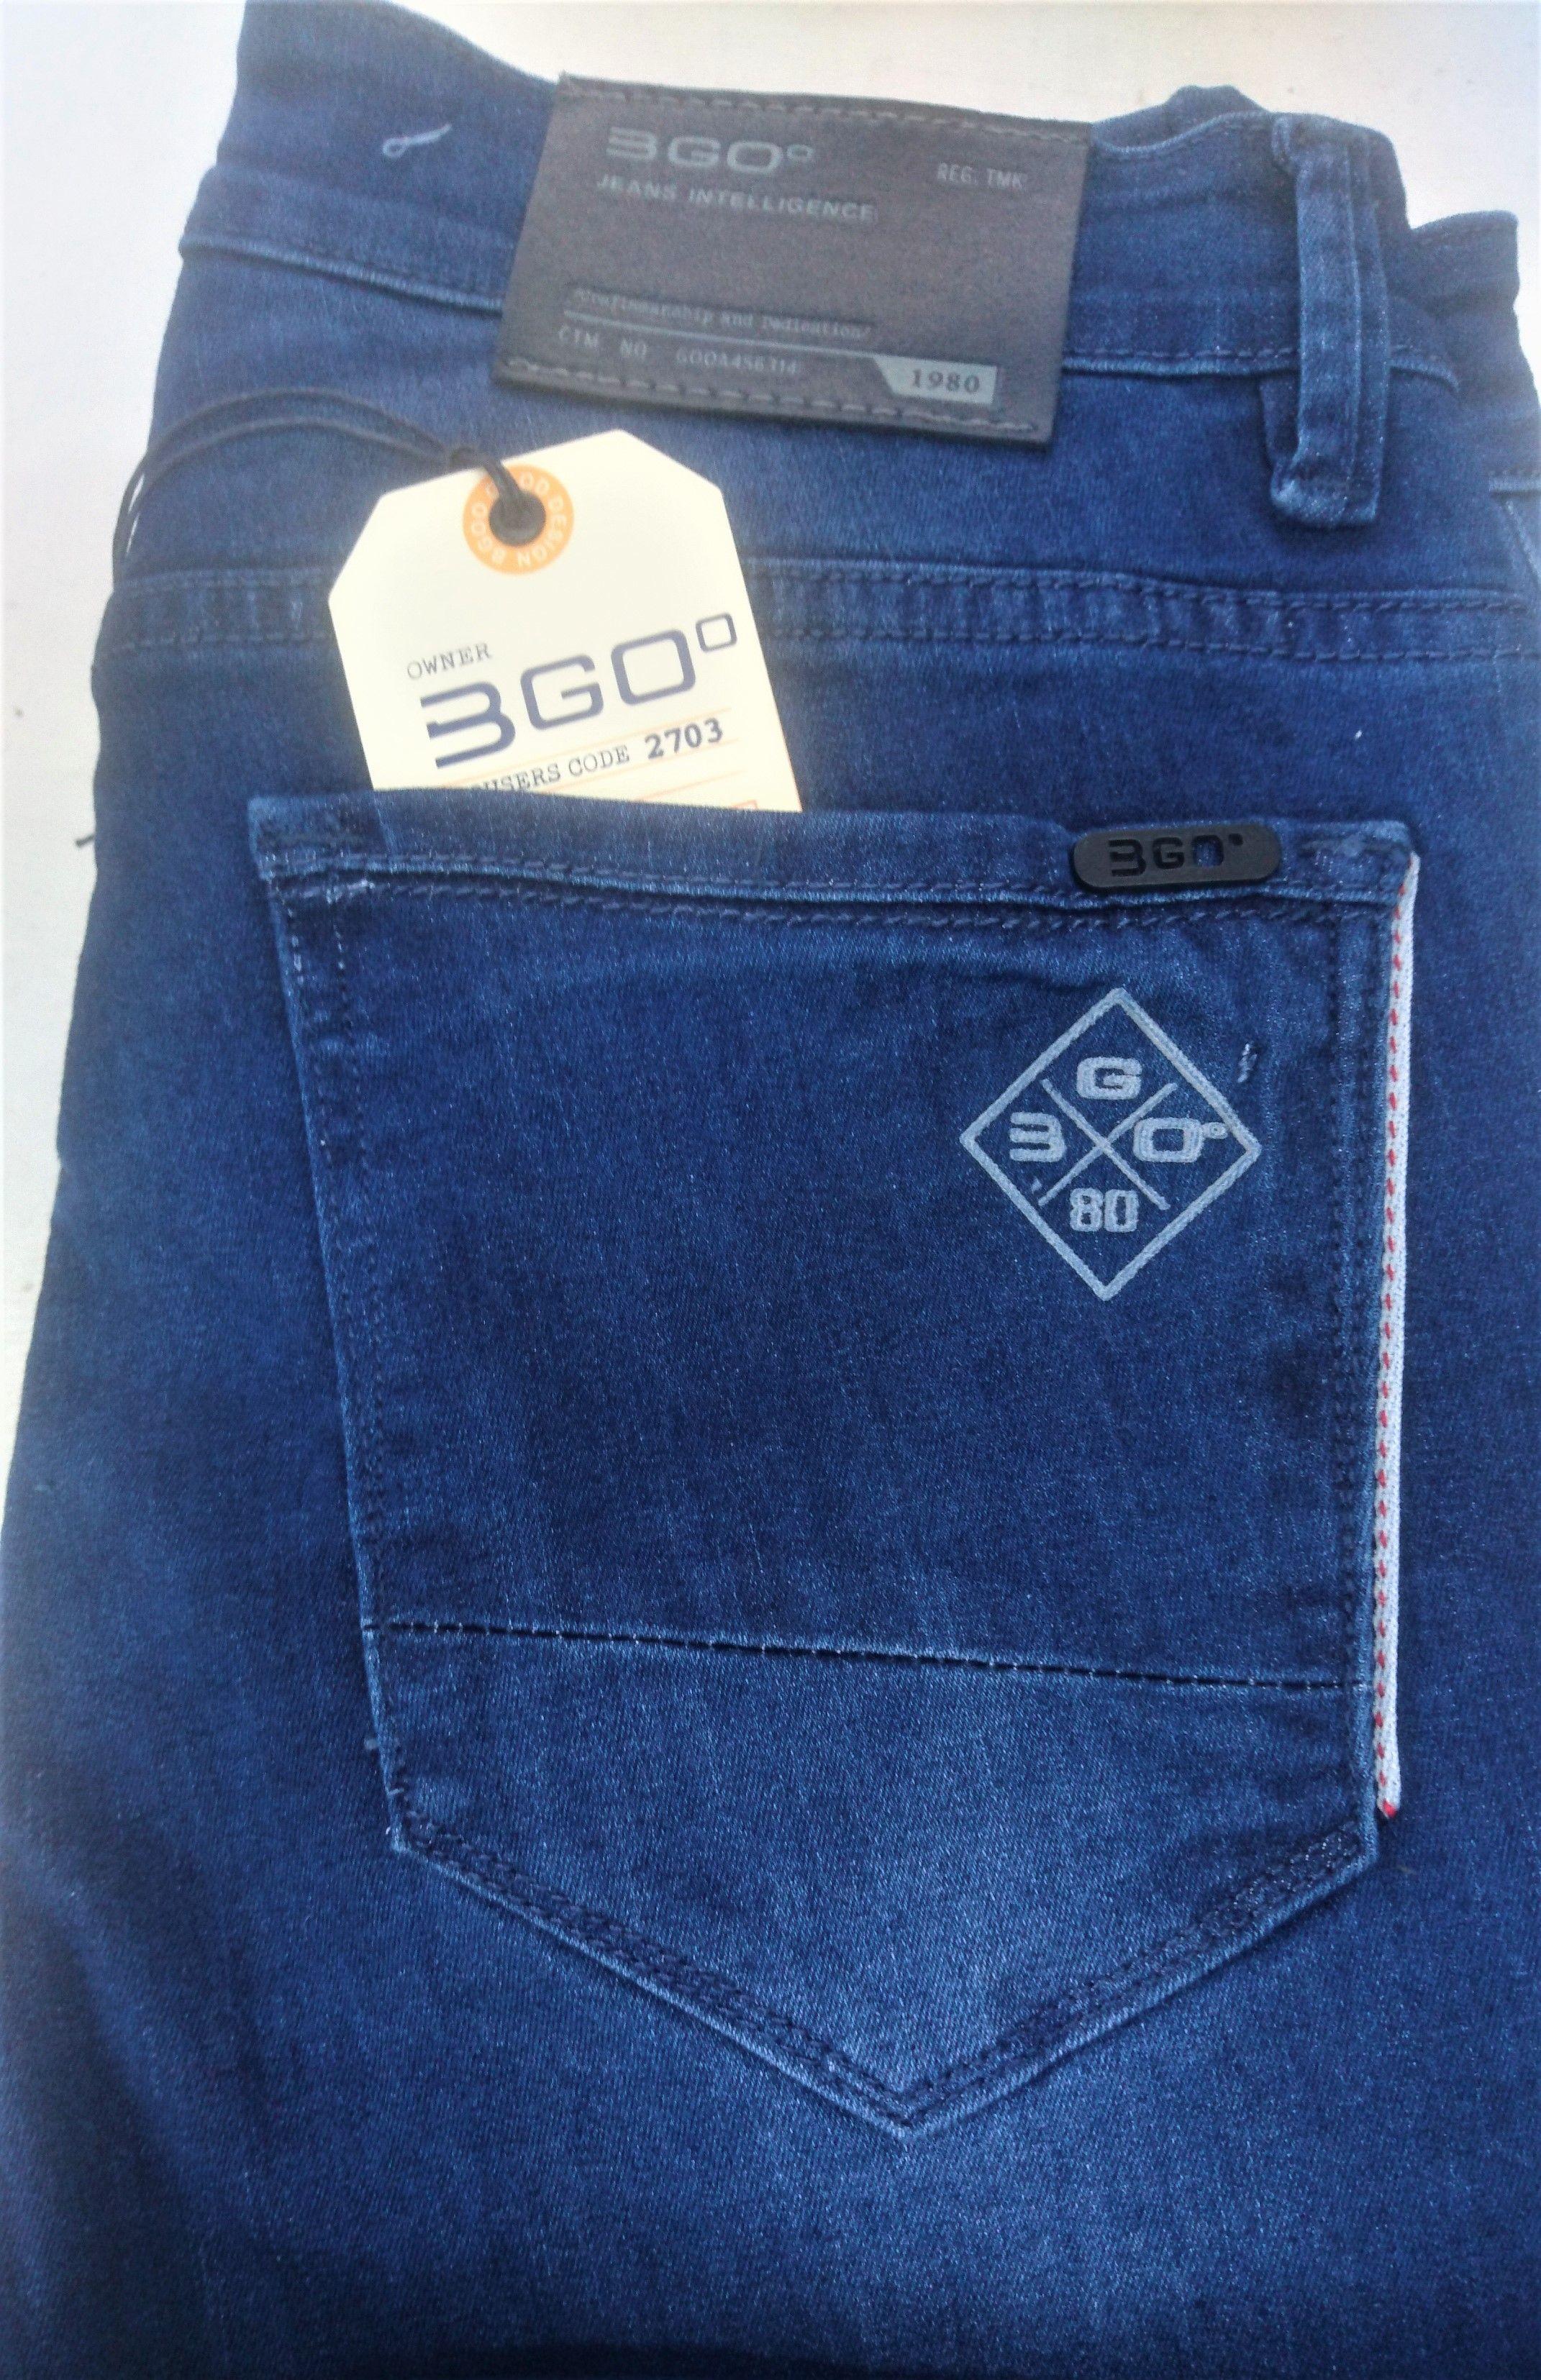 Bgo Estampado Colored Jeans Cool Designs Jeans